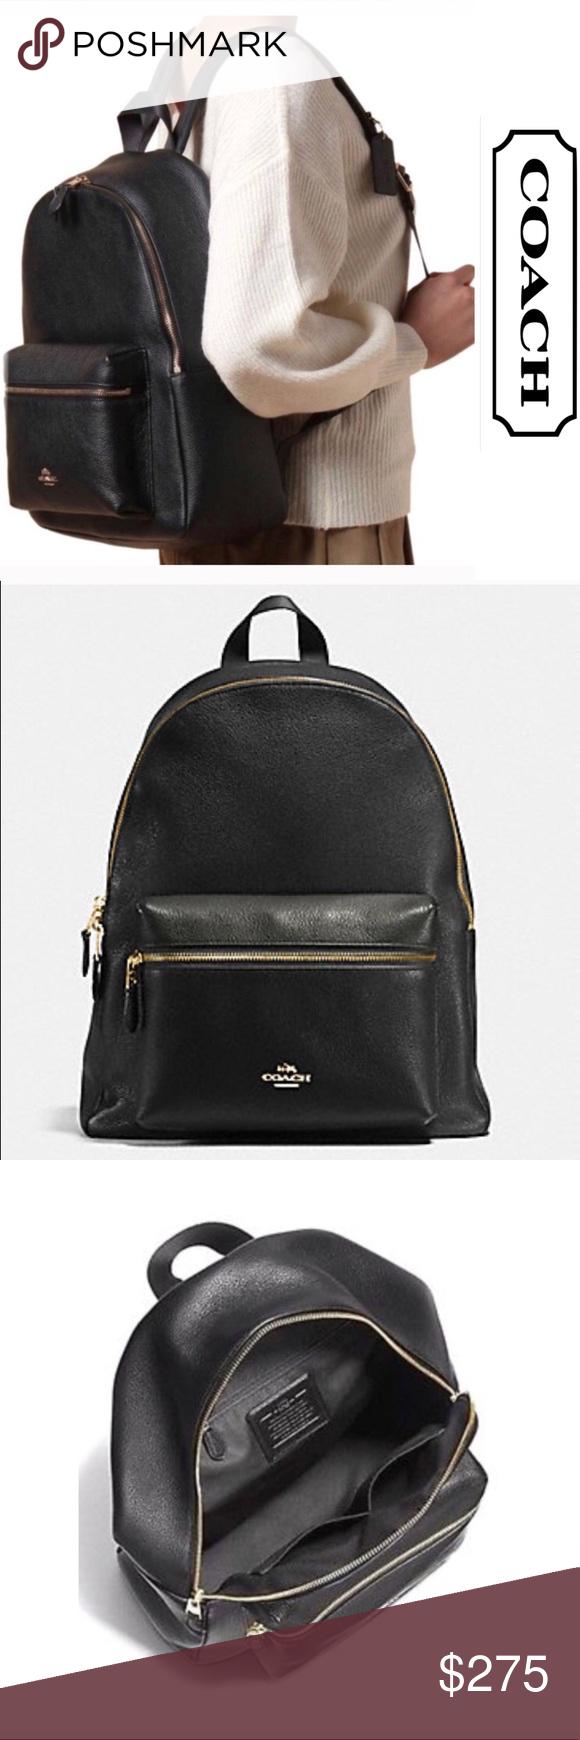 c9f0f4dae Large COACH Charlie Black Leather Backpack Purse Large coach backpack purse.  Authentic. Coach Bags Backpacks